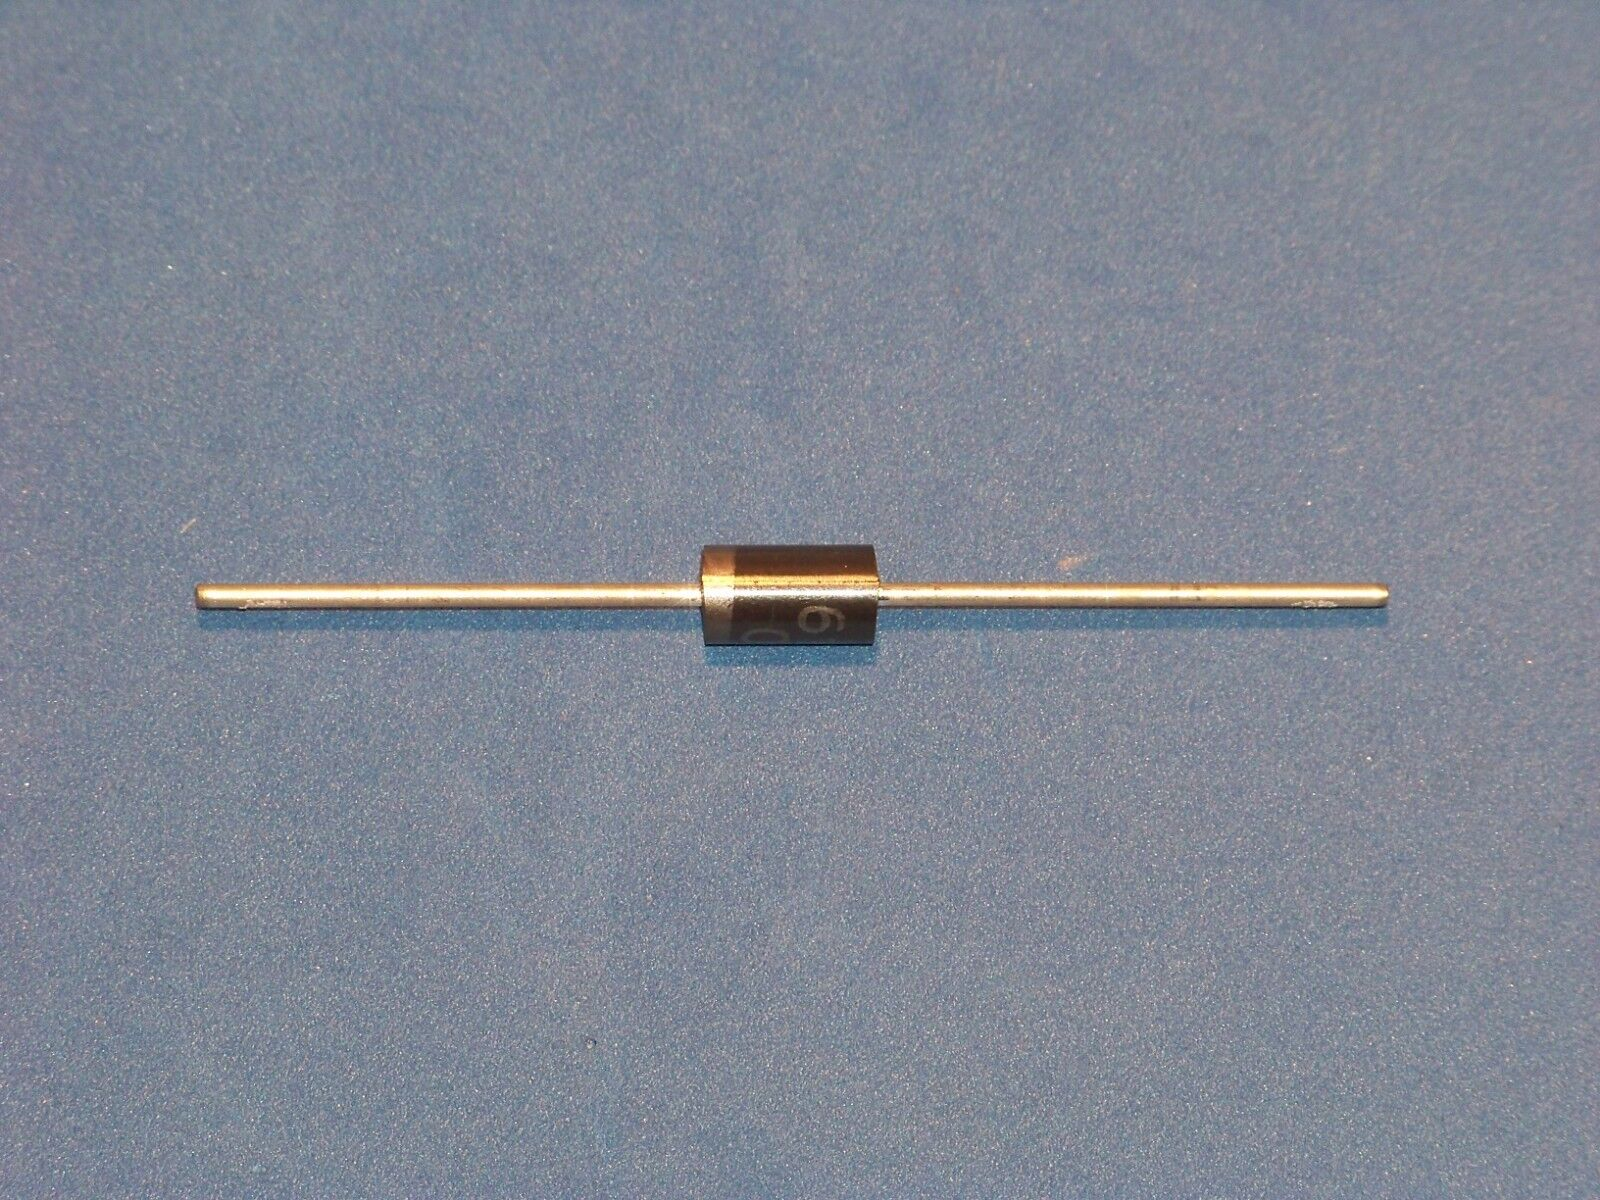 10 x Schottky Diode 60V 5A SB560 Gleichrichterdiode Diode Rectifier Dioden